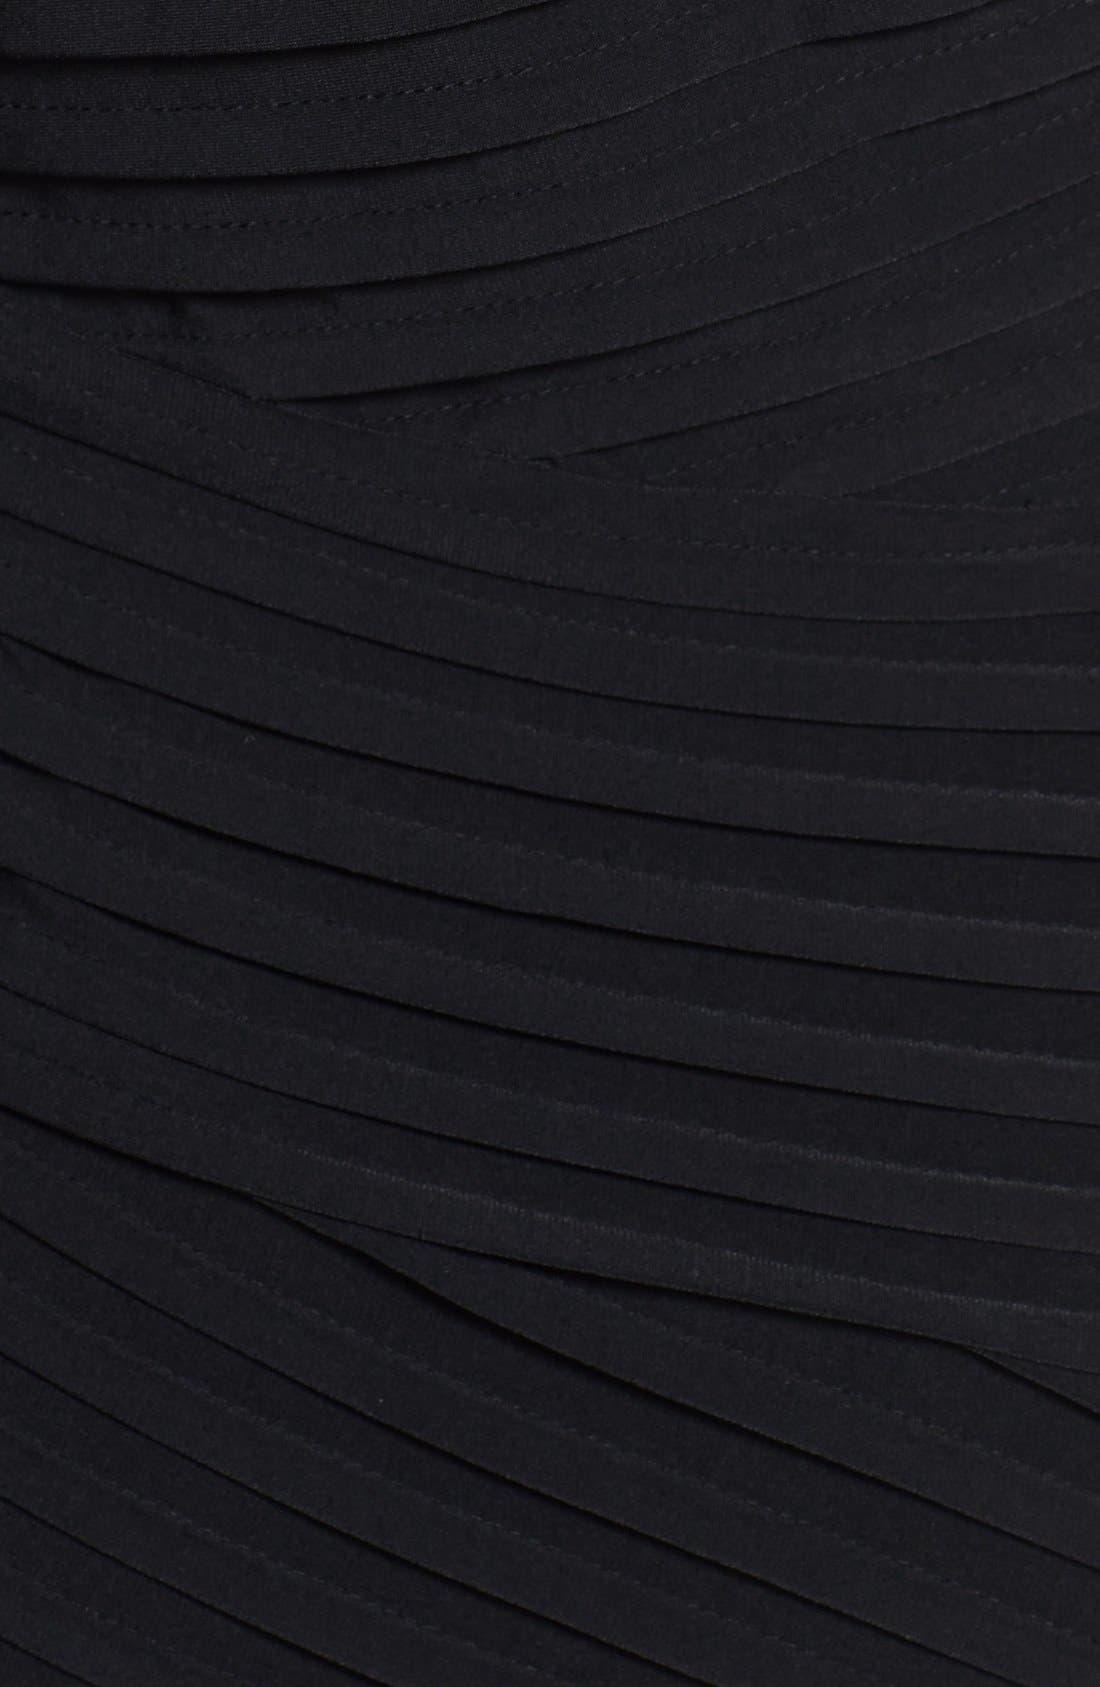 Alternate Image 3  - Calvin Klein Mesh Yoke & Pleat Jersey Sheath Dress